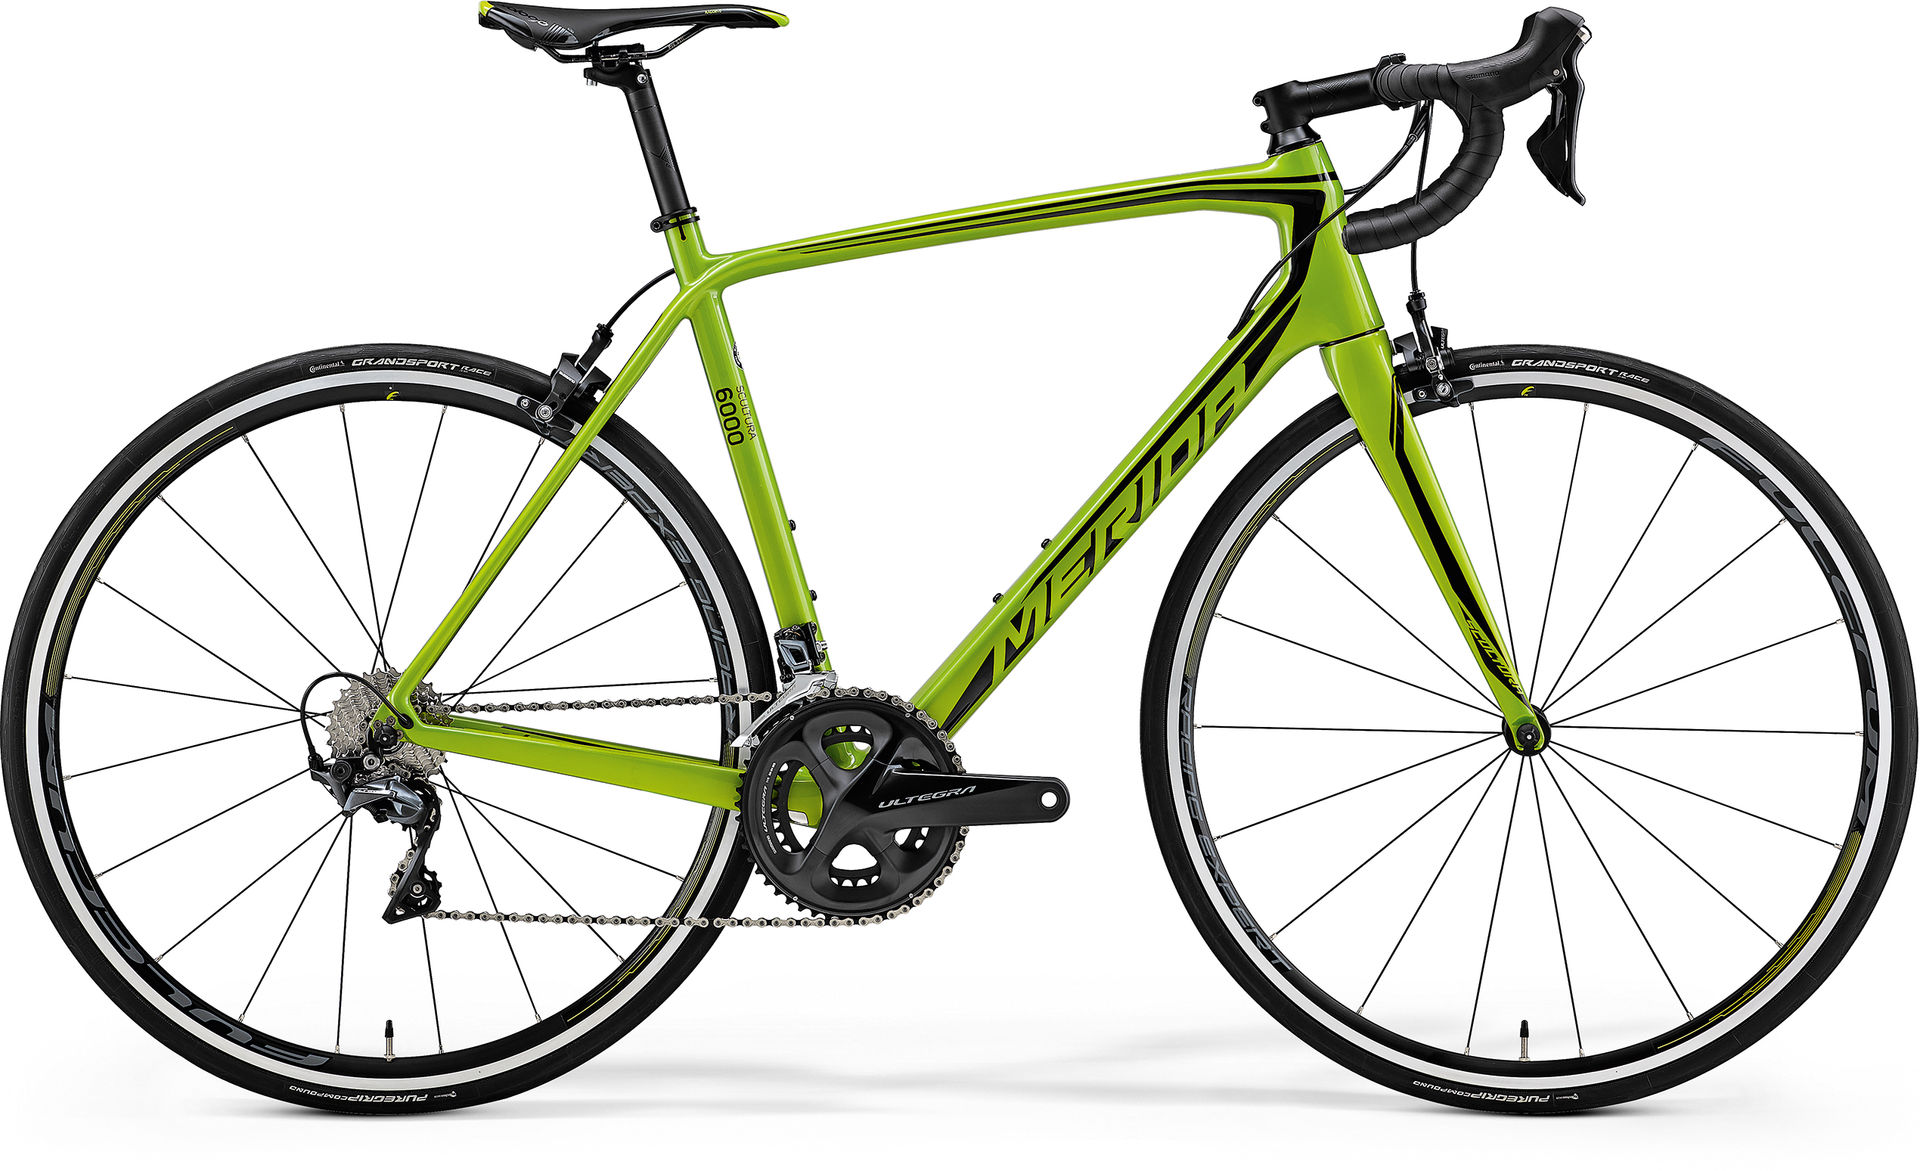 CyclingPlus testet das SCULTURA DISC 6000